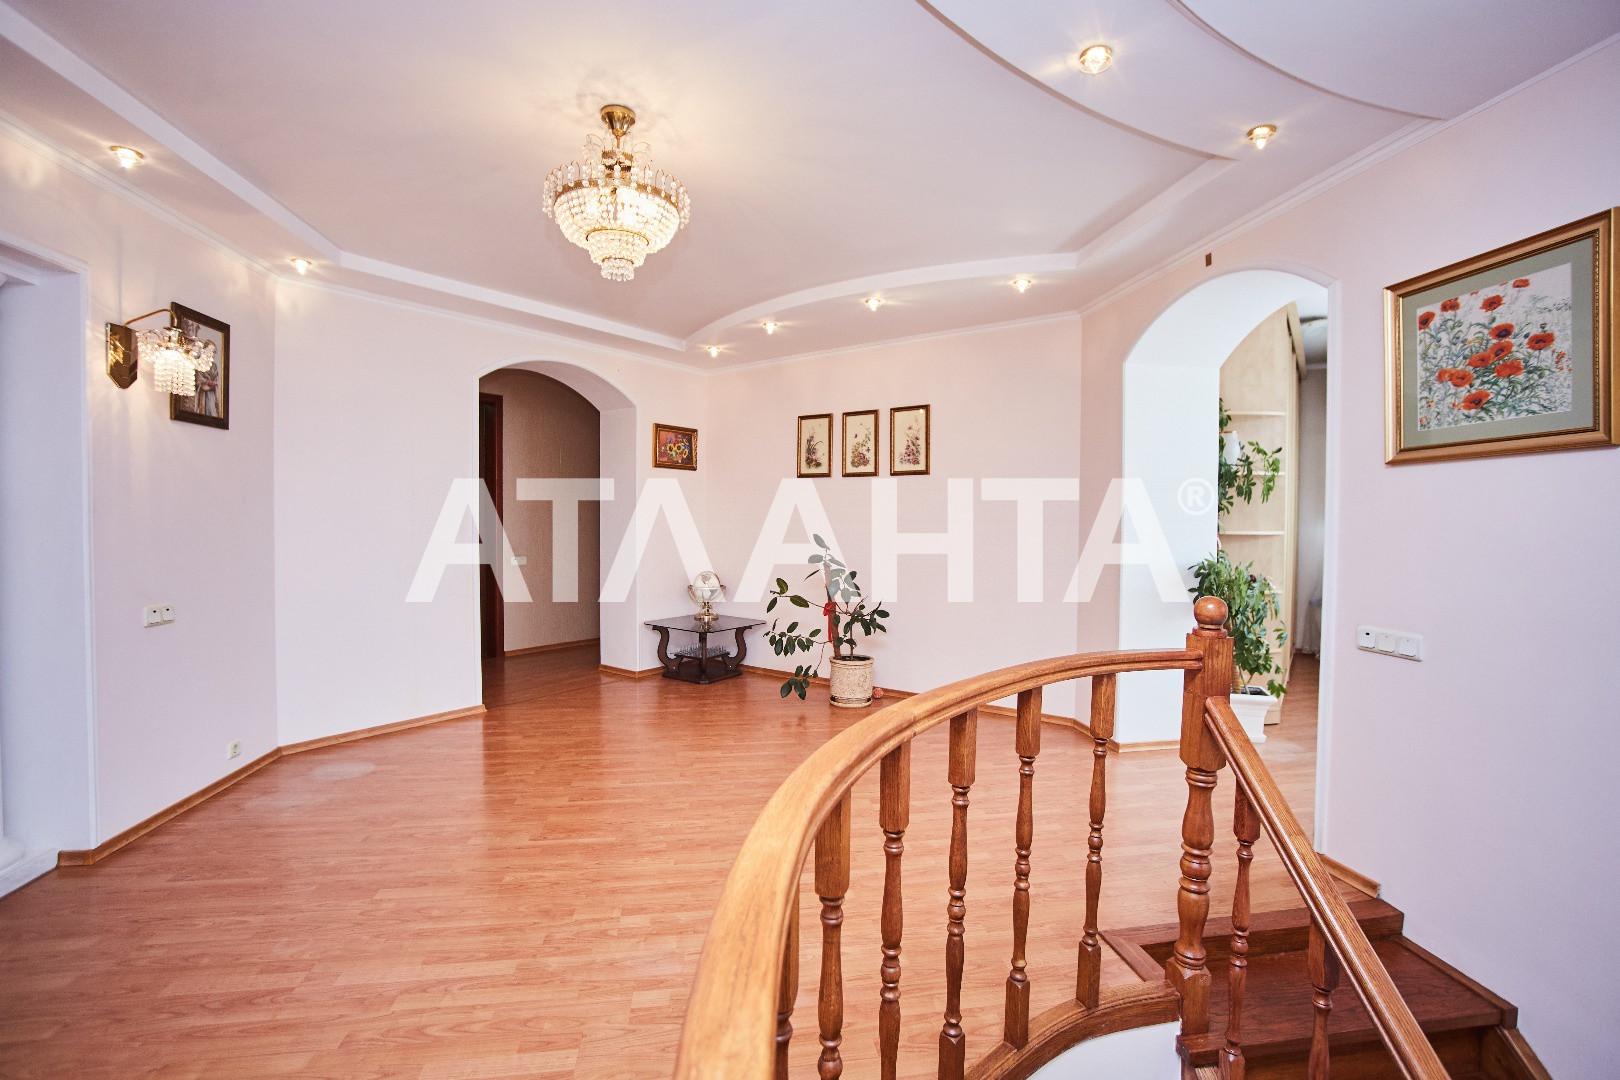 Продается Многоуровневая Квартира на ул. Посмитного — 295 000 у.е. (фото №20)